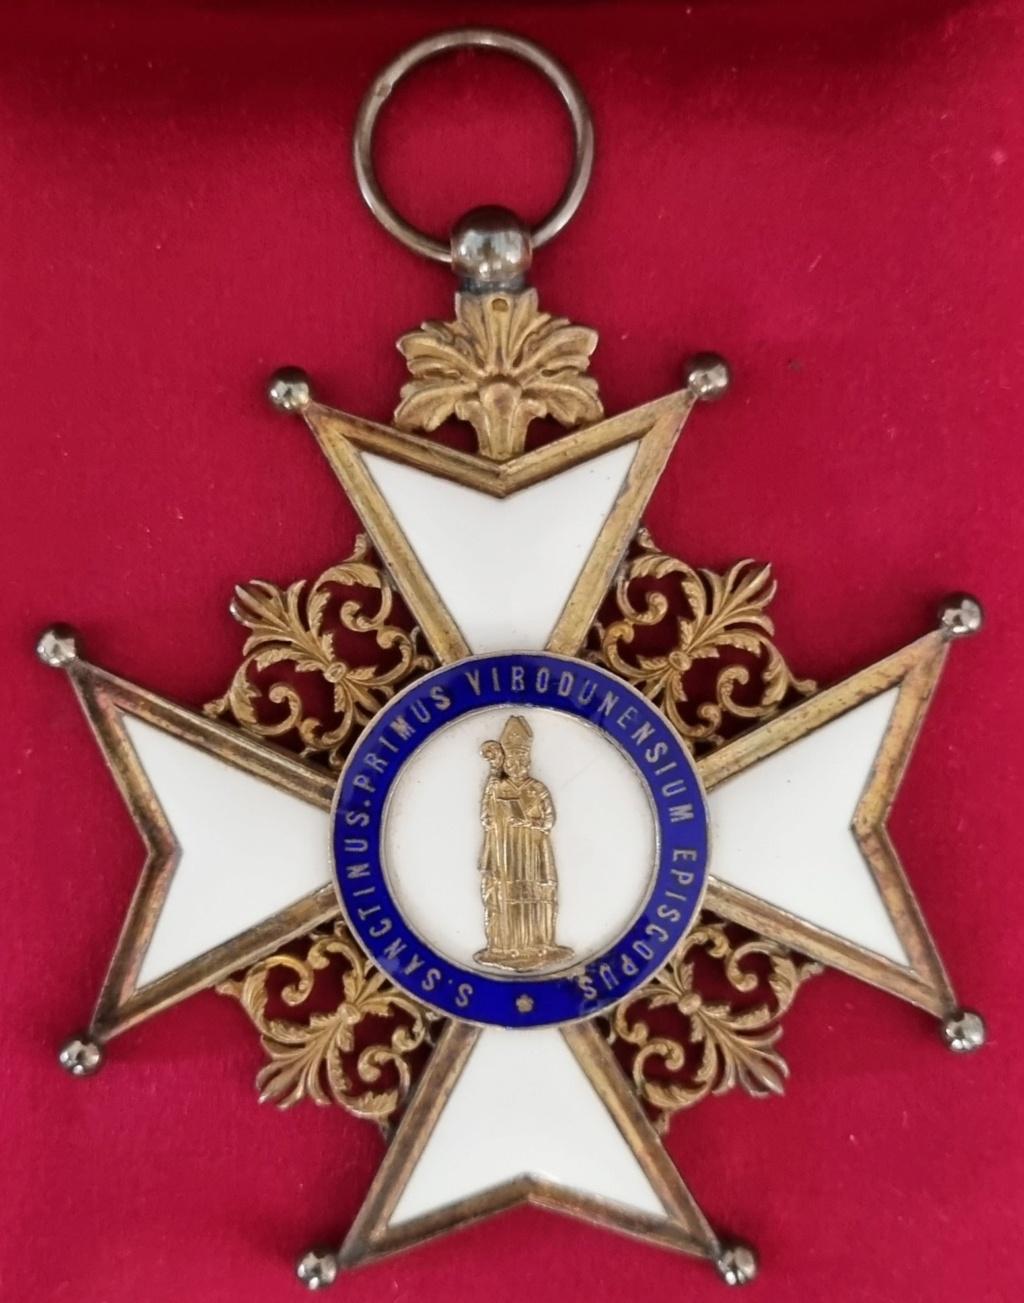 Médaille à identifier - Merci d'avance  20210516